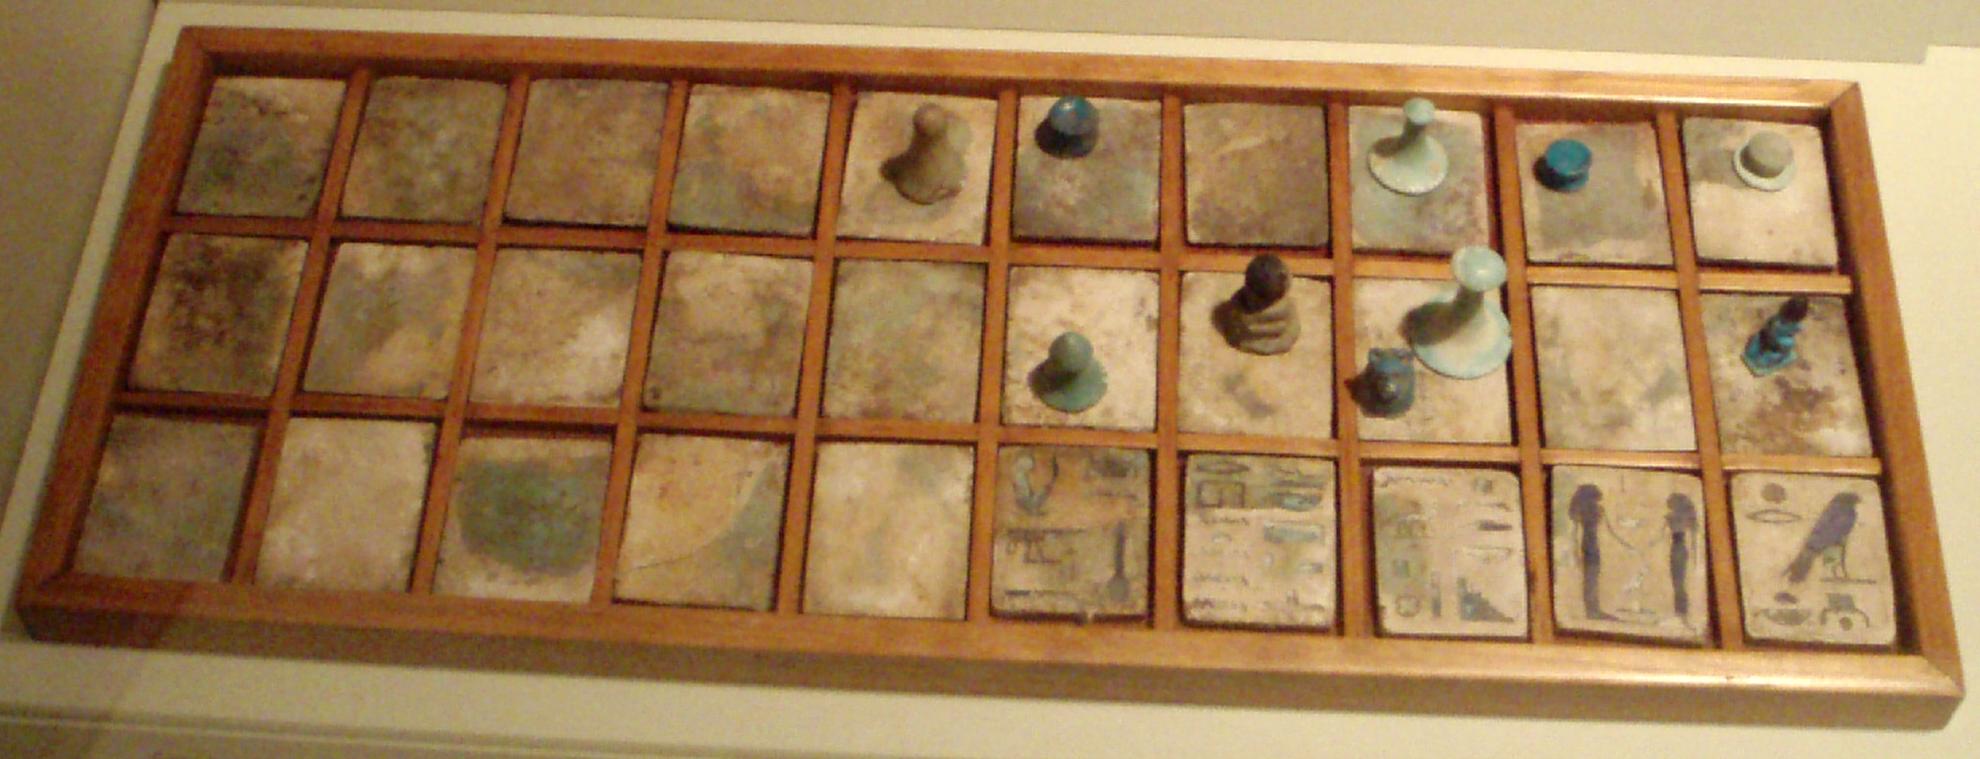 old egyptian gambling game